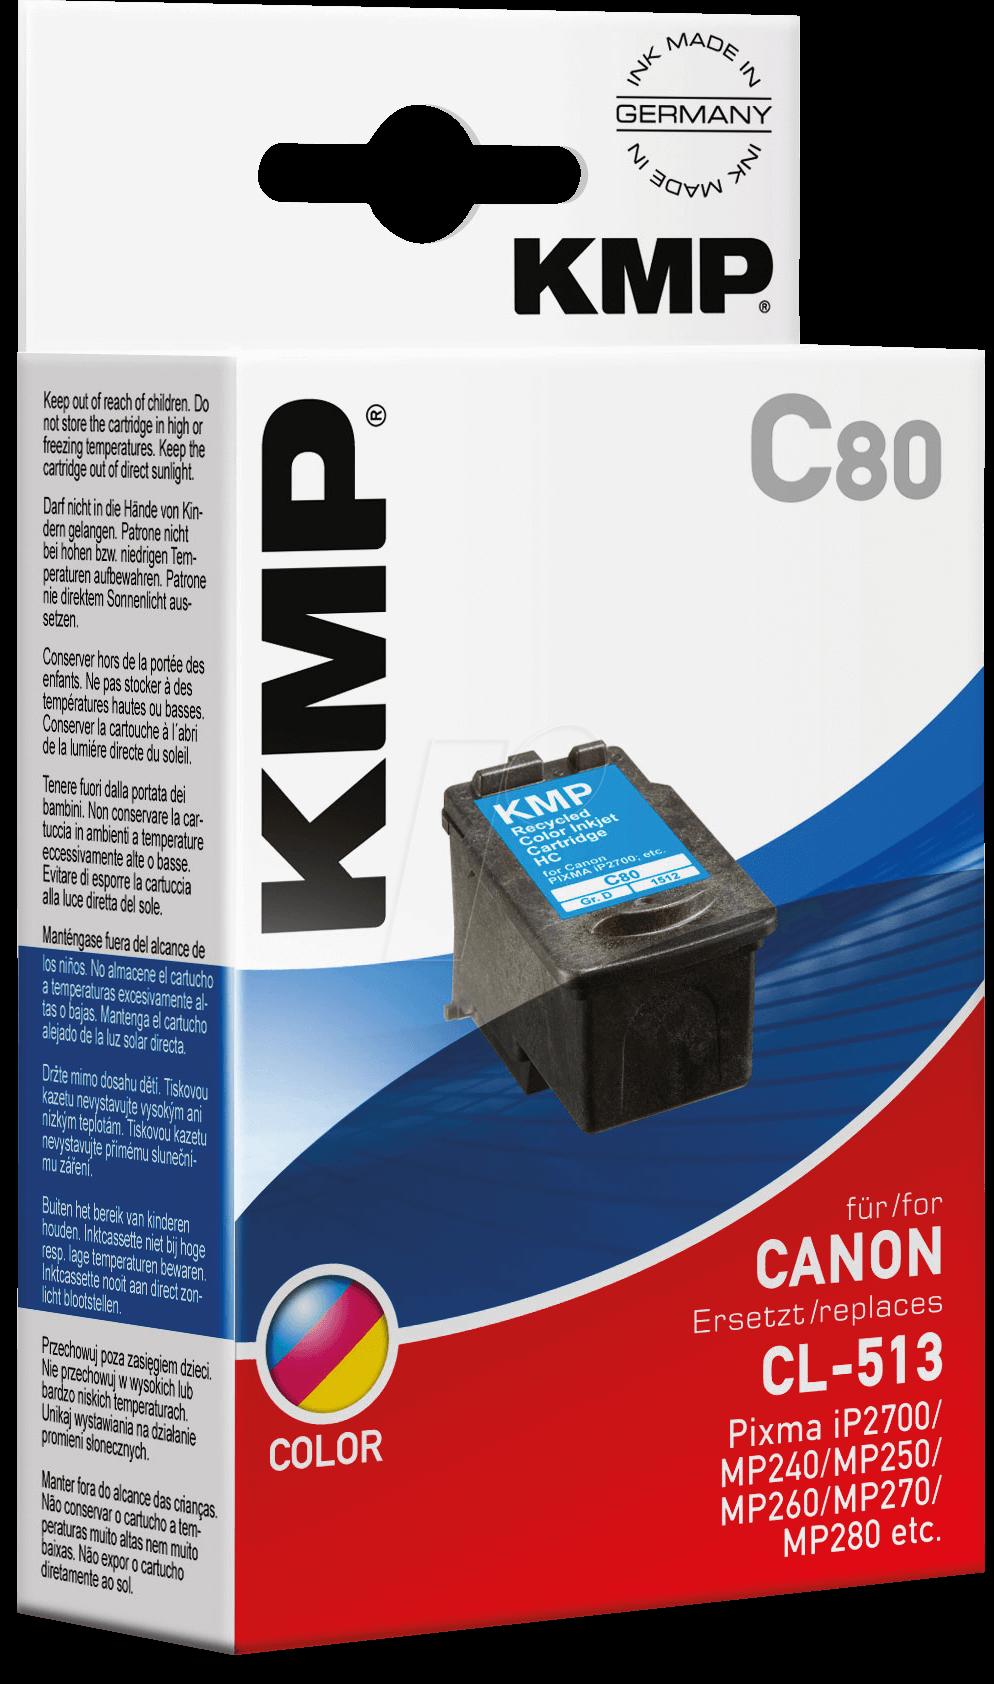 KMP 1512,4530 - Tinte - Canon - 3-farbig - CL-513 - refill